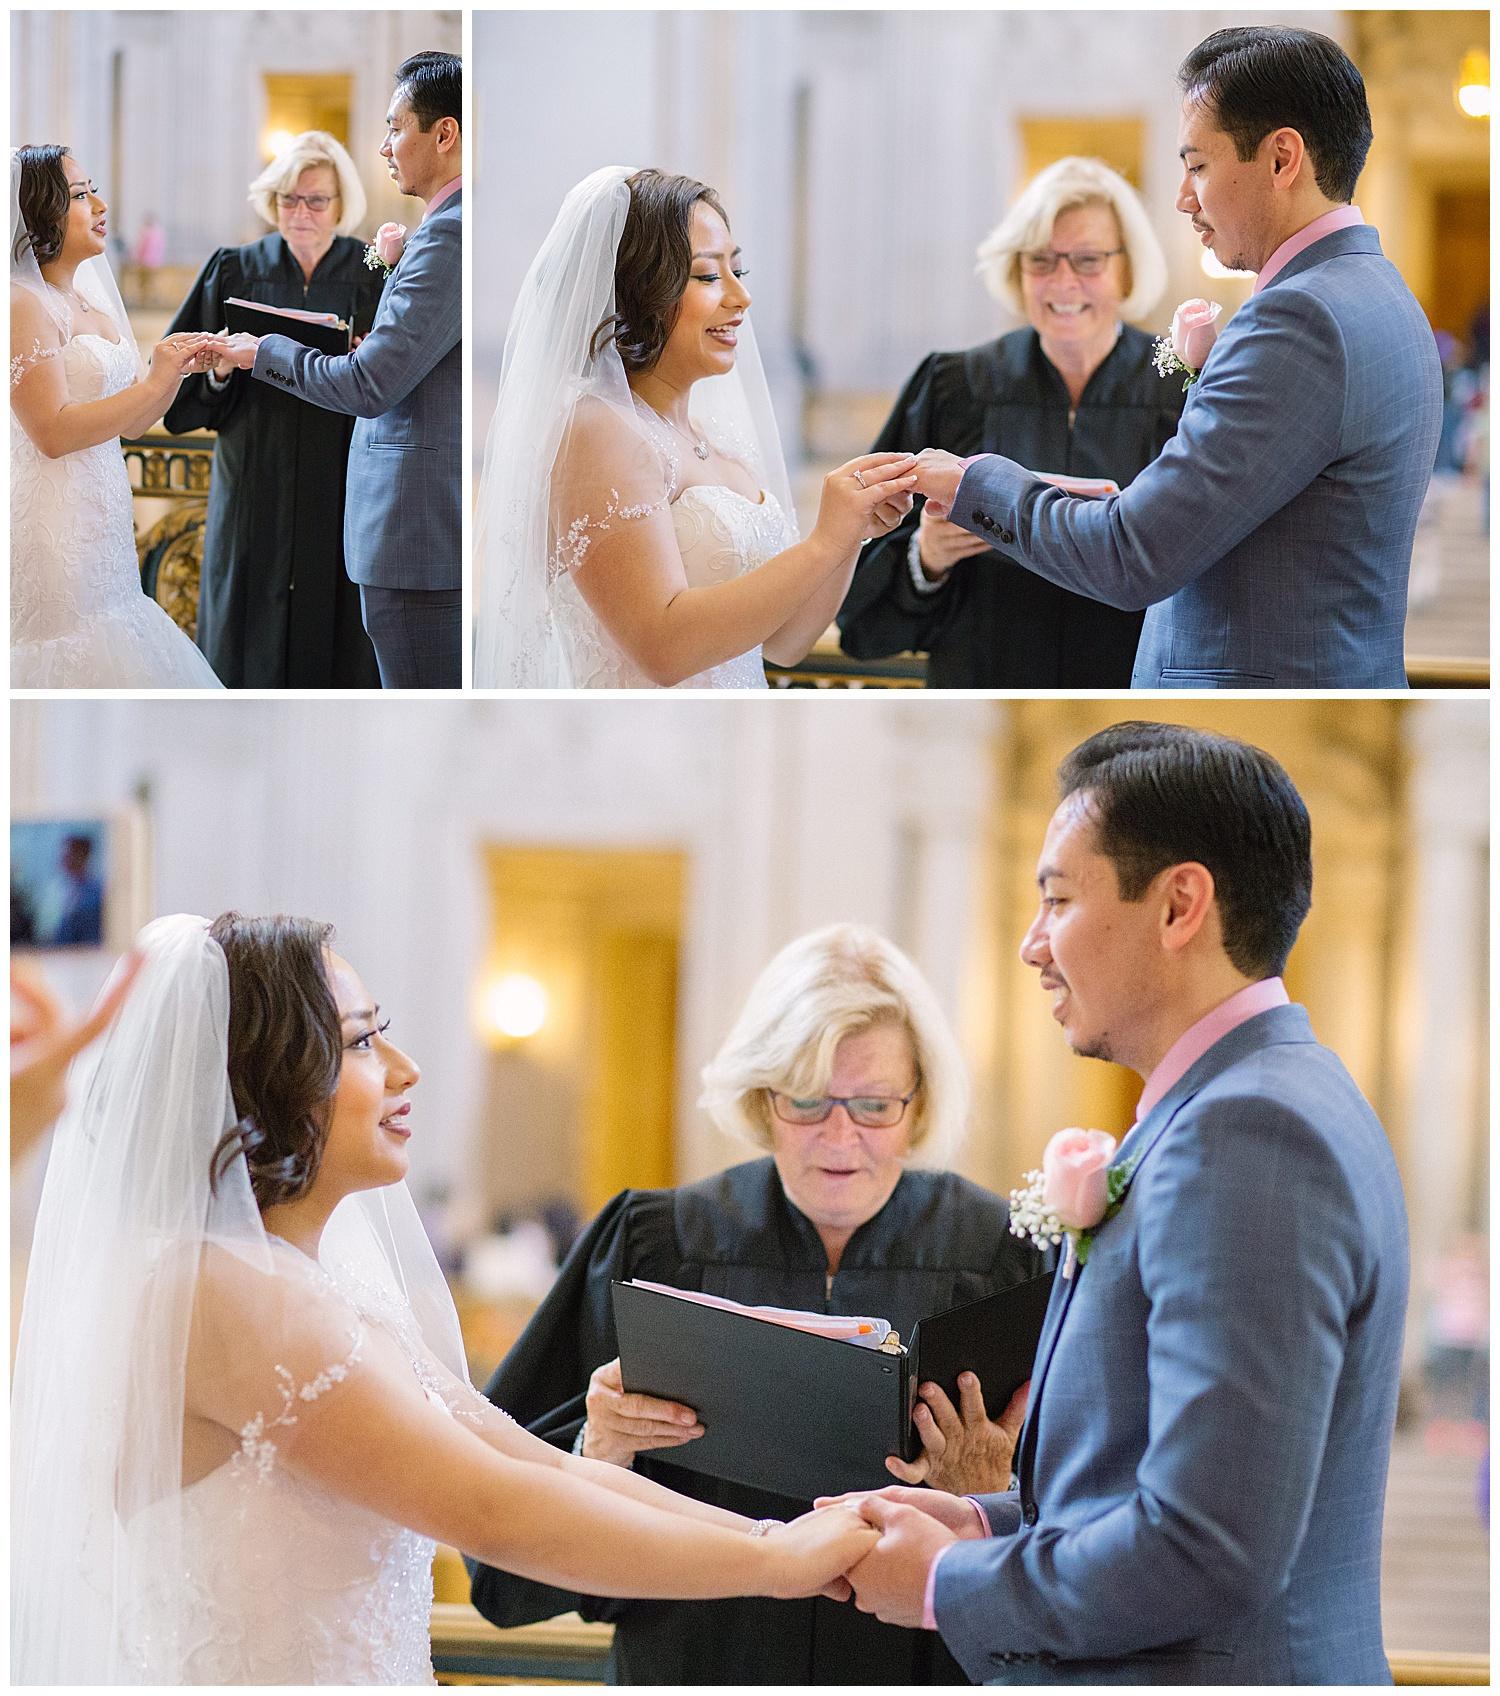 khariza-rae-photography-bay-area-wedding-photographer_0099.jpg